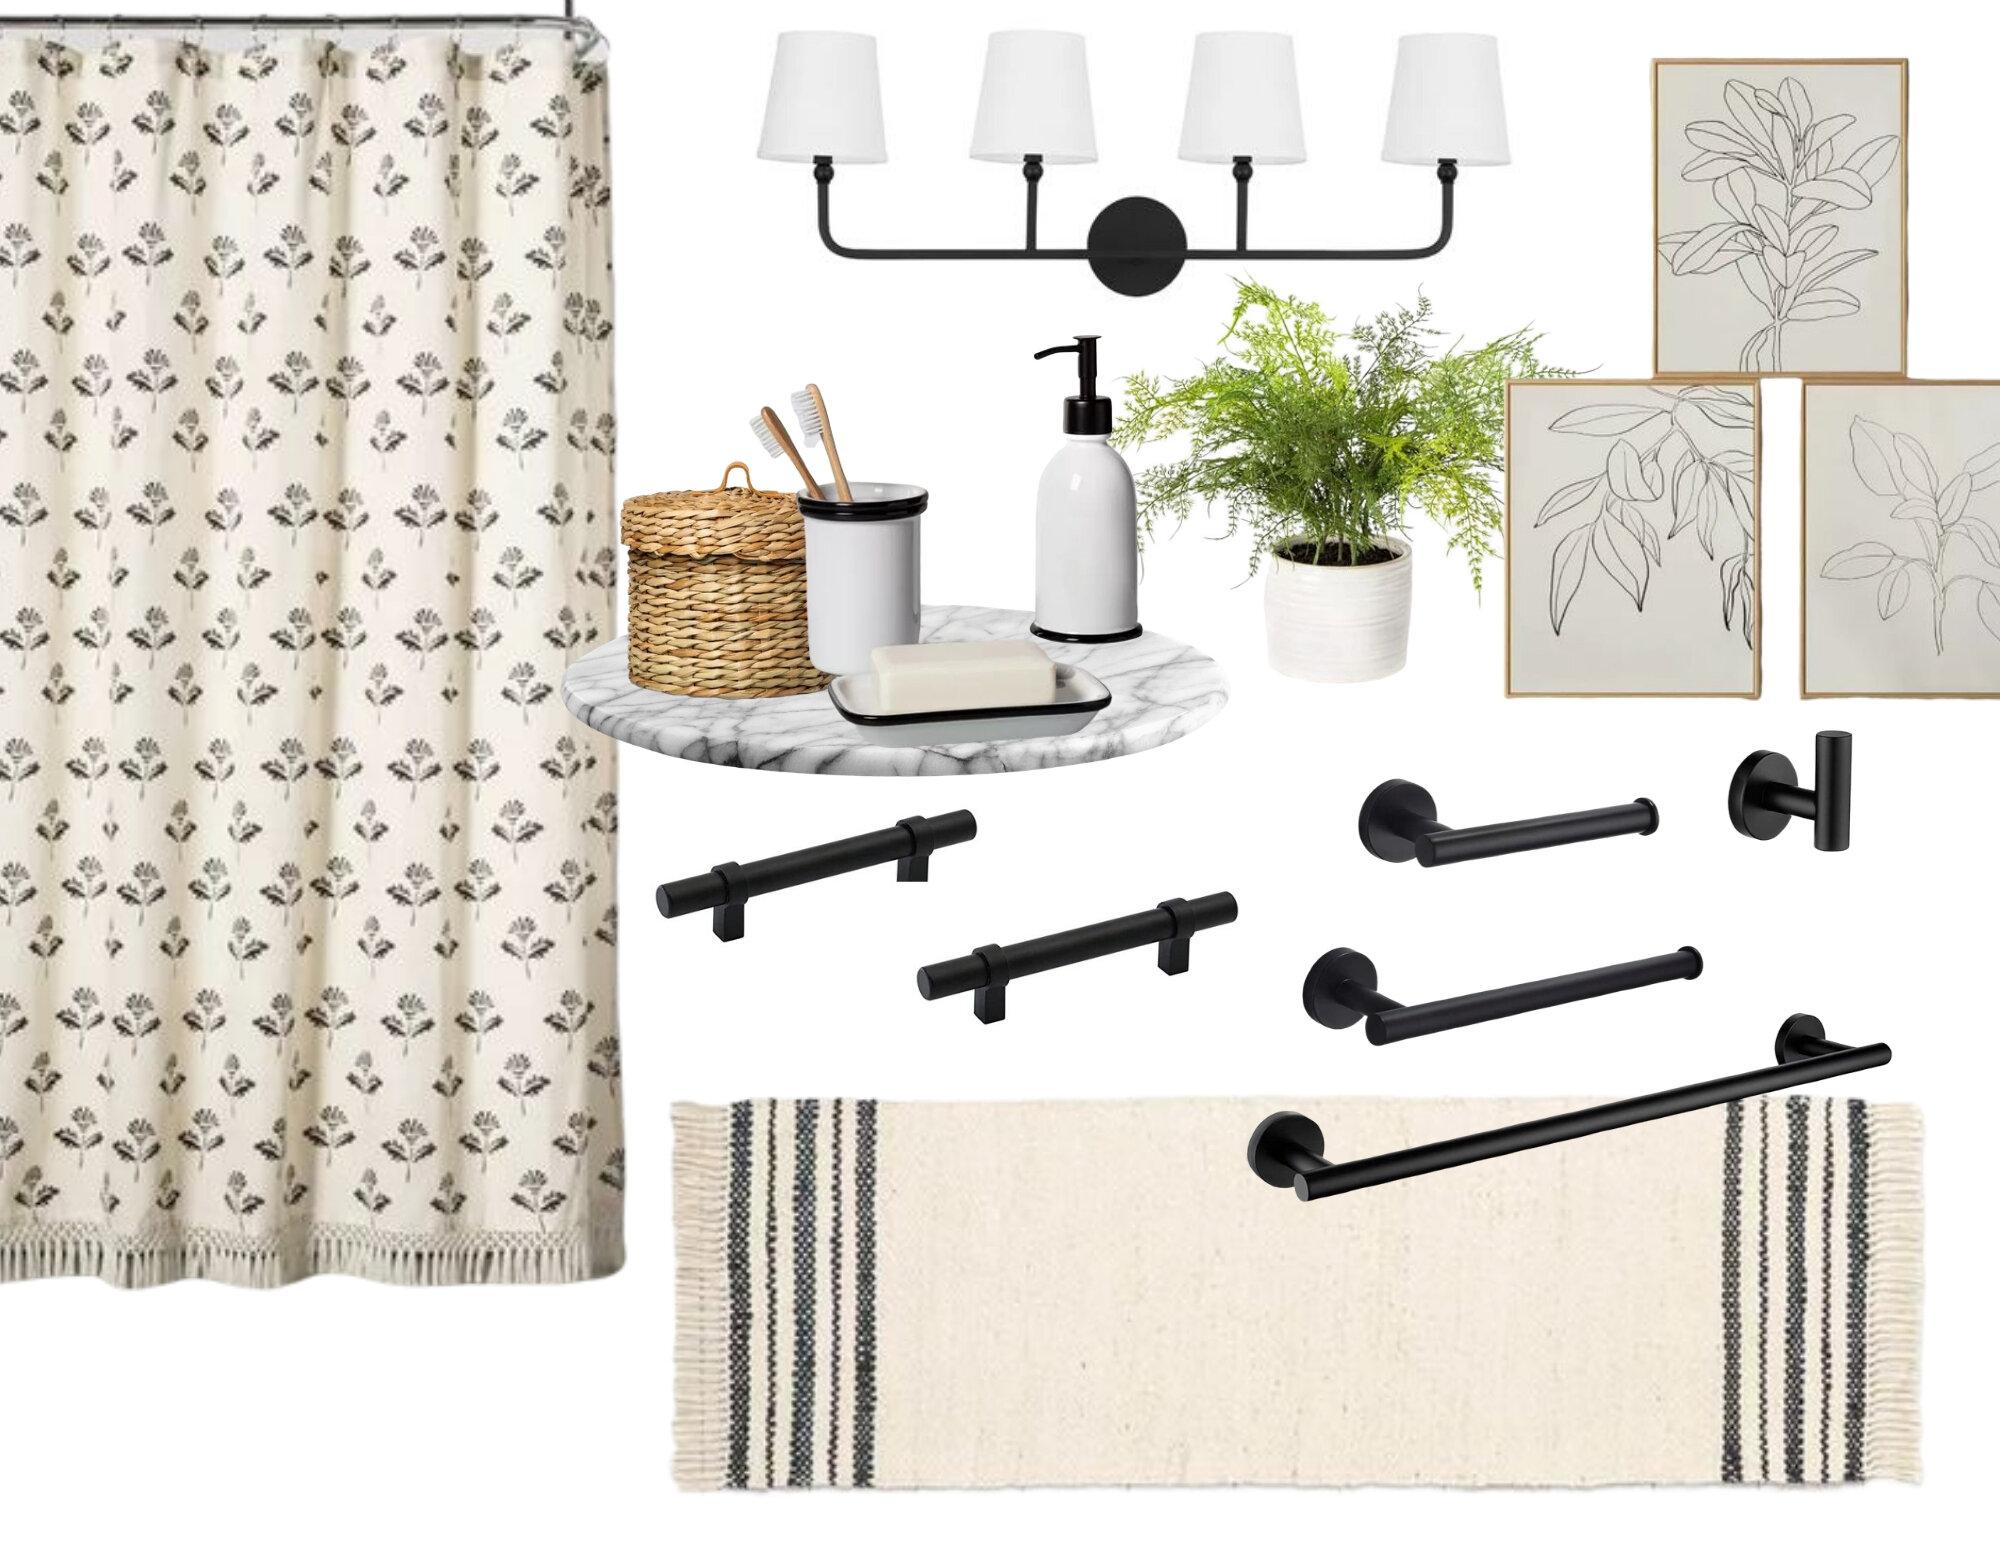 Modern Farmhouse Bathroom Decor Blog Gathered Living